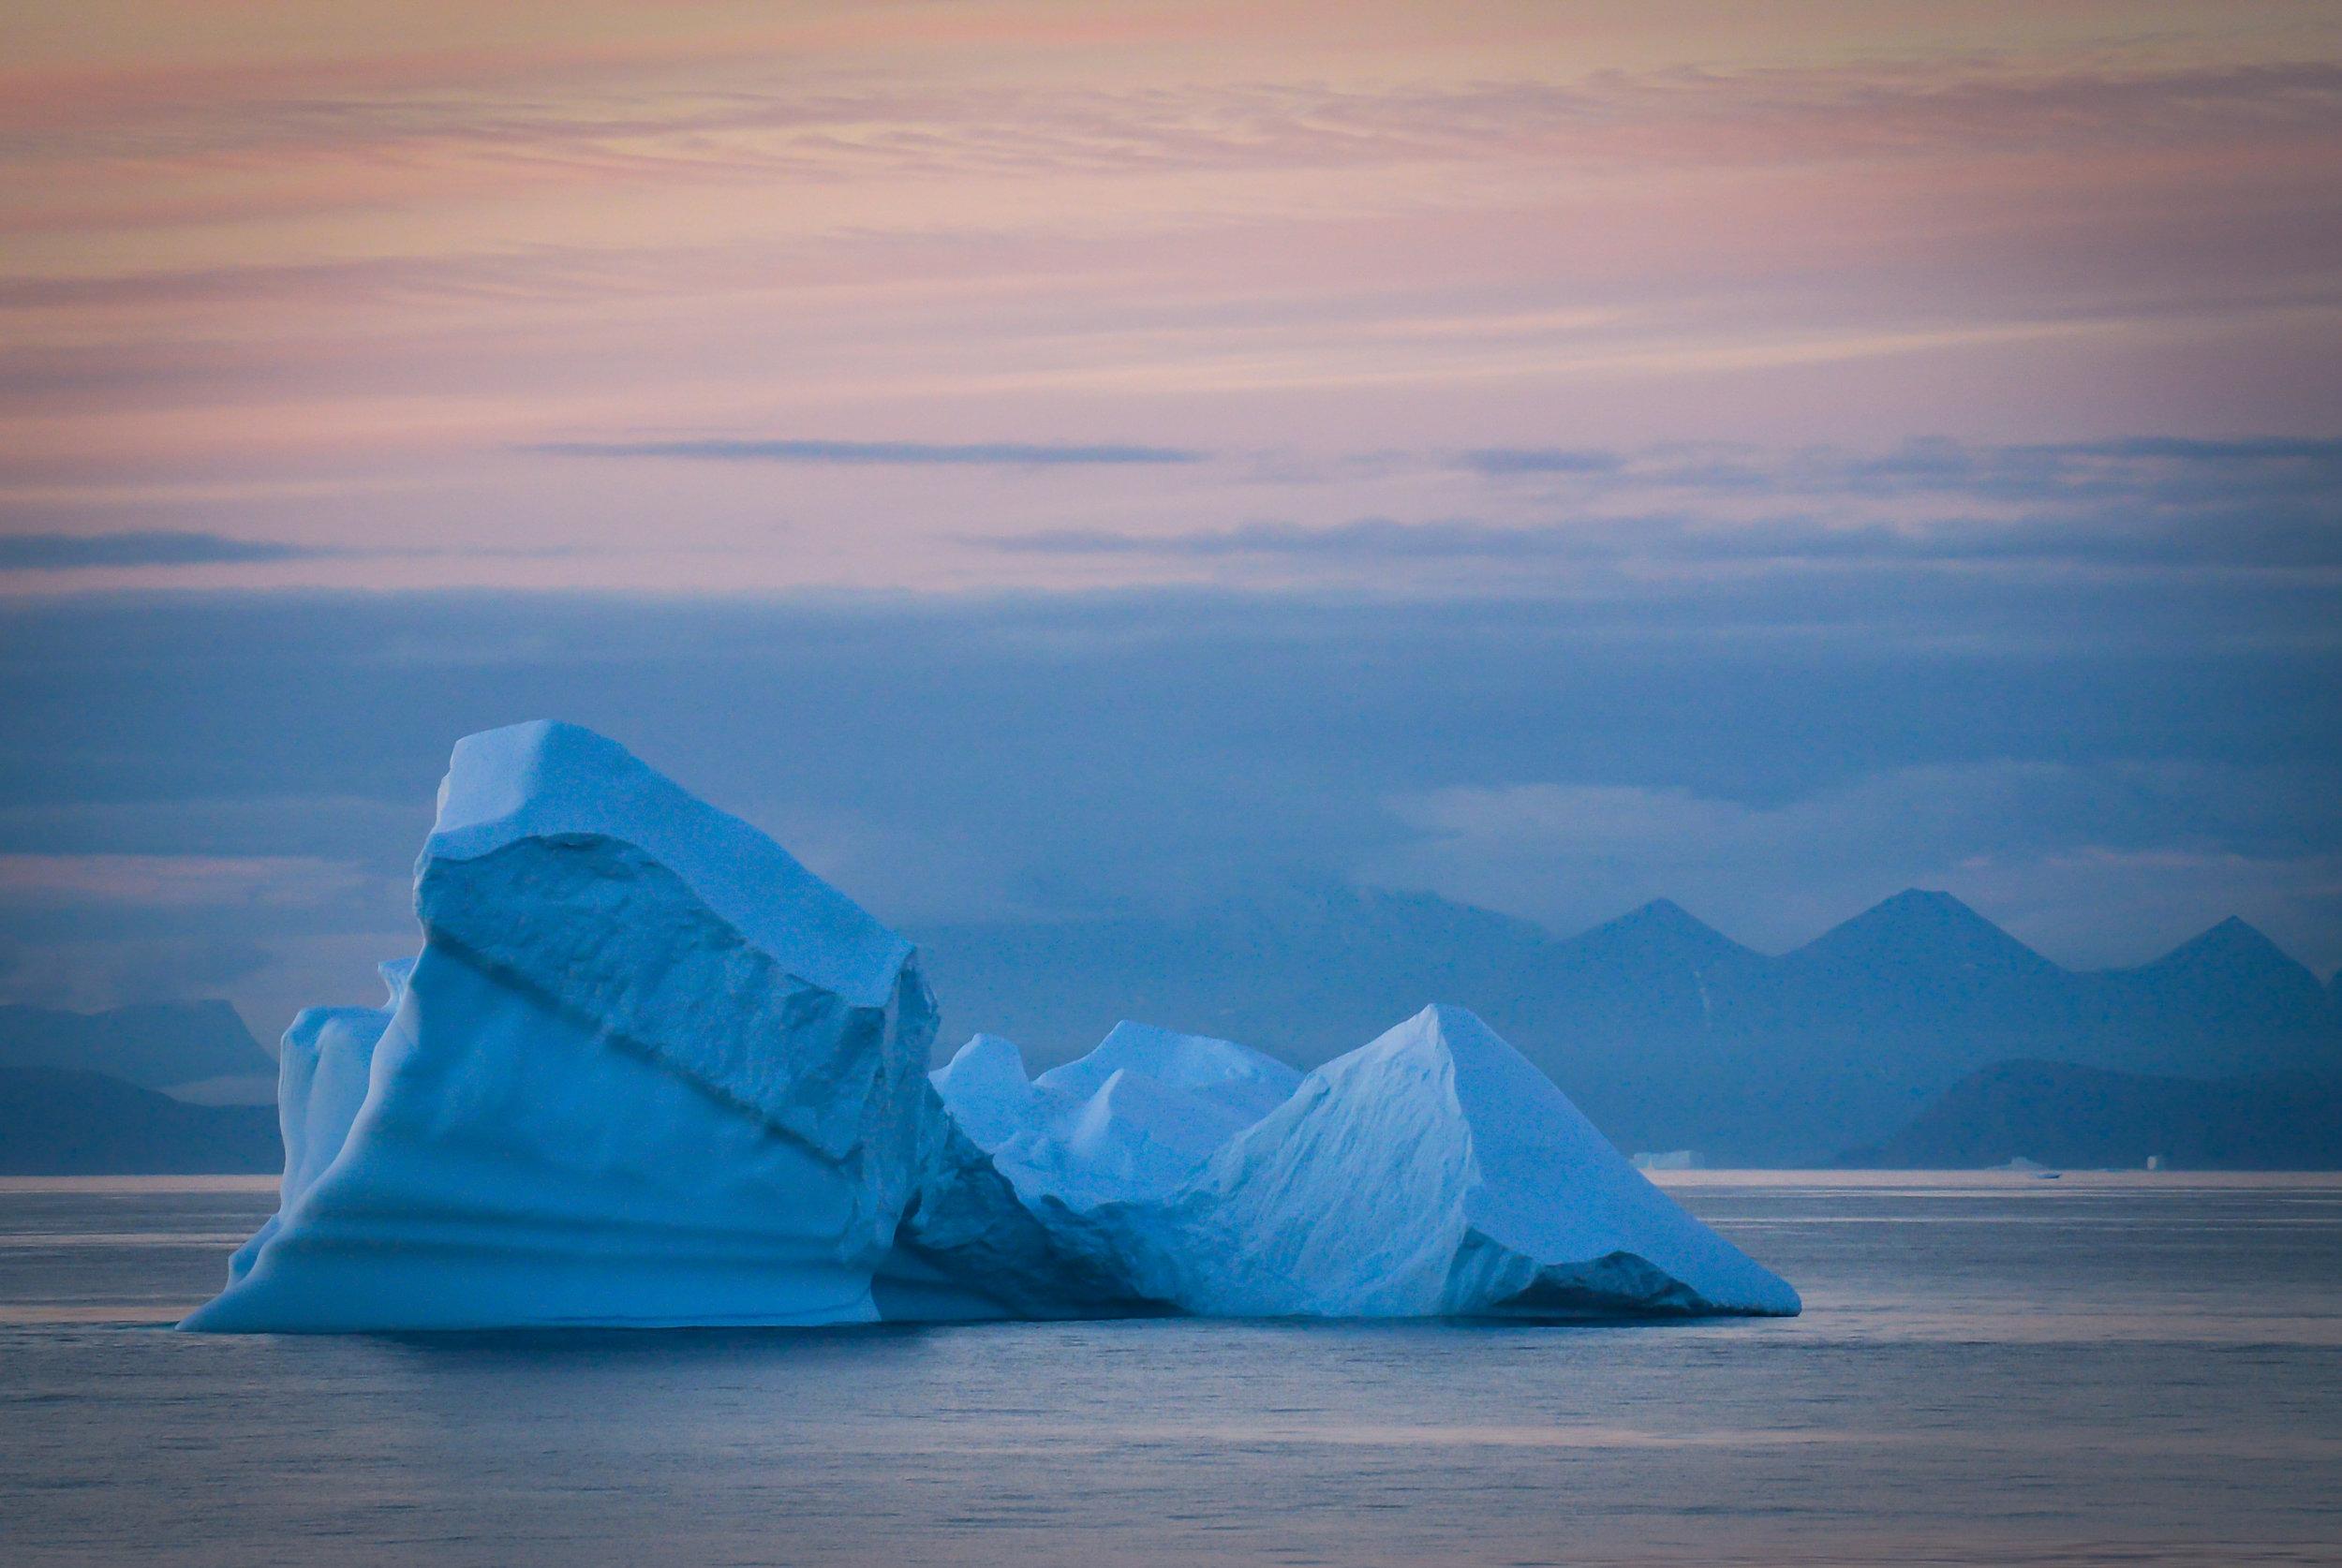 Iceberg at sunset off the coast of Greenland